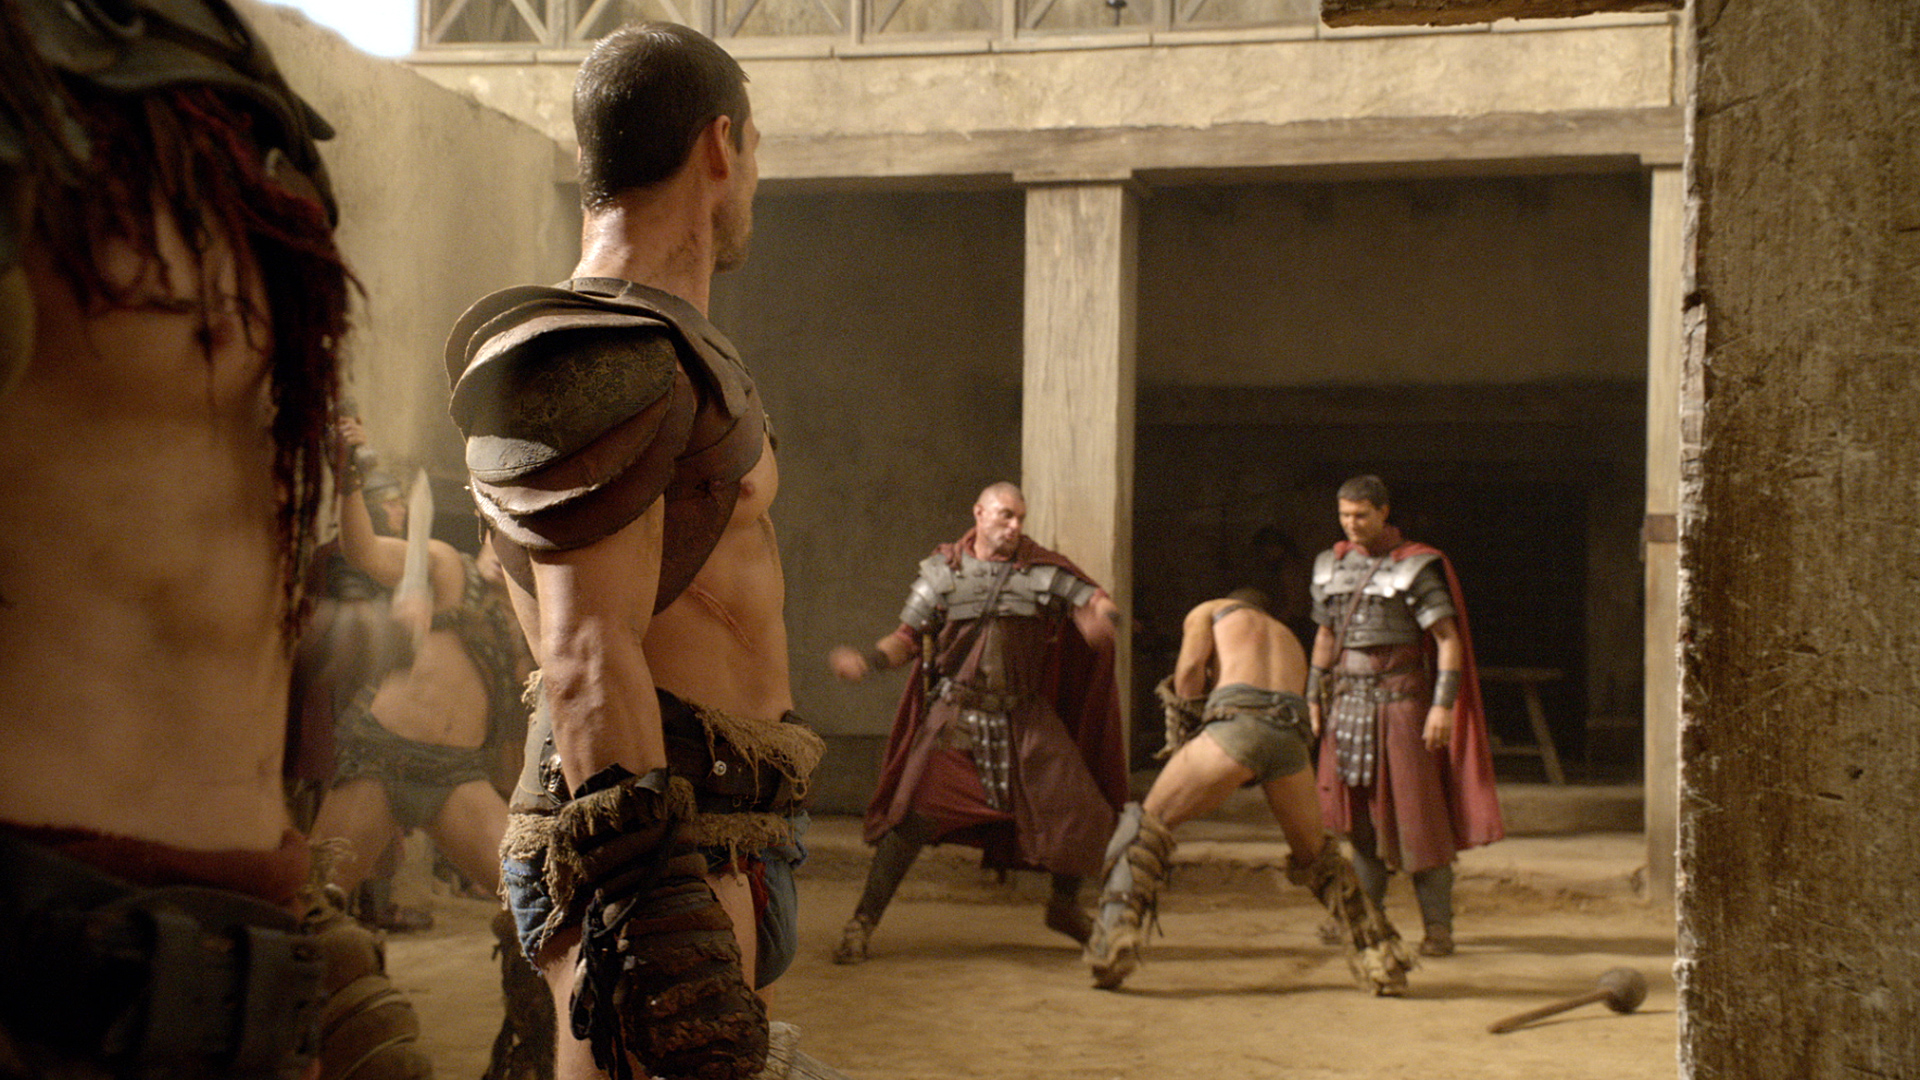 1416397914 s01_e0113_03_140968837129___CC___1920x1080 spartacus recap kill them all syfy,Spartacus House Of Batiatus Floor Plan